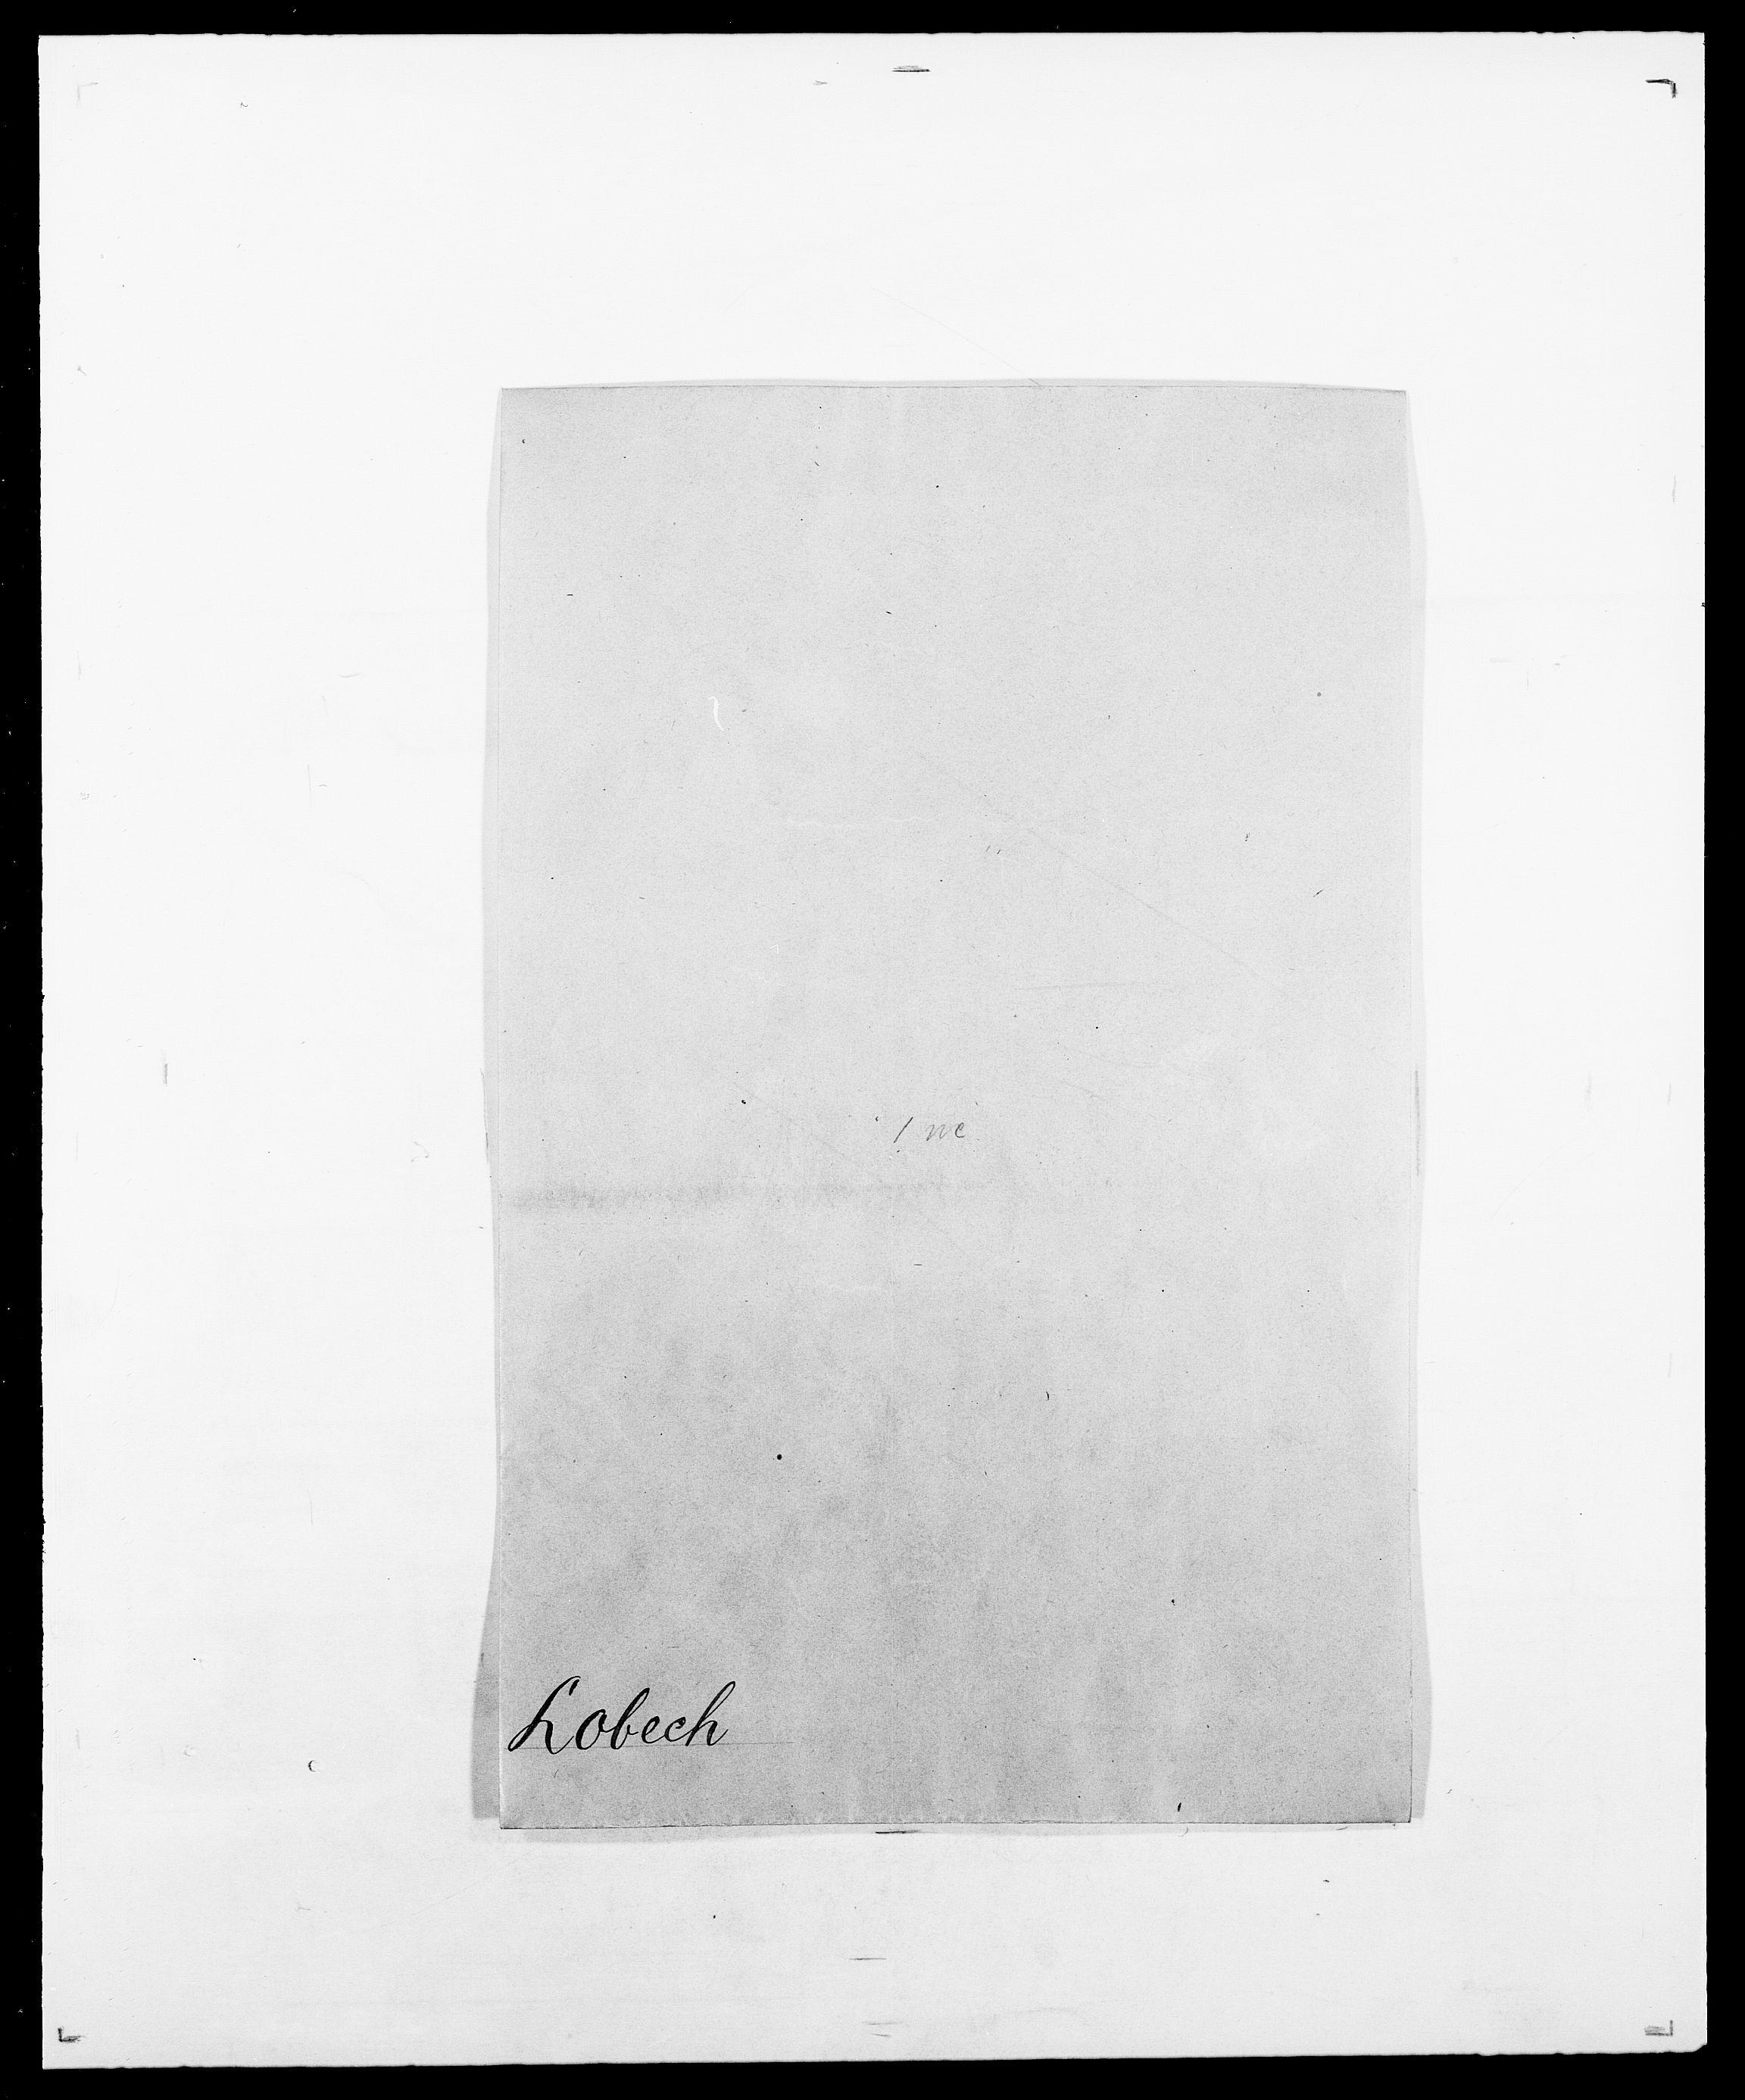 SAO, Delgobe, Charles Antoine - samling, D/Da/L0024: Lobech - Lærum, s. 1